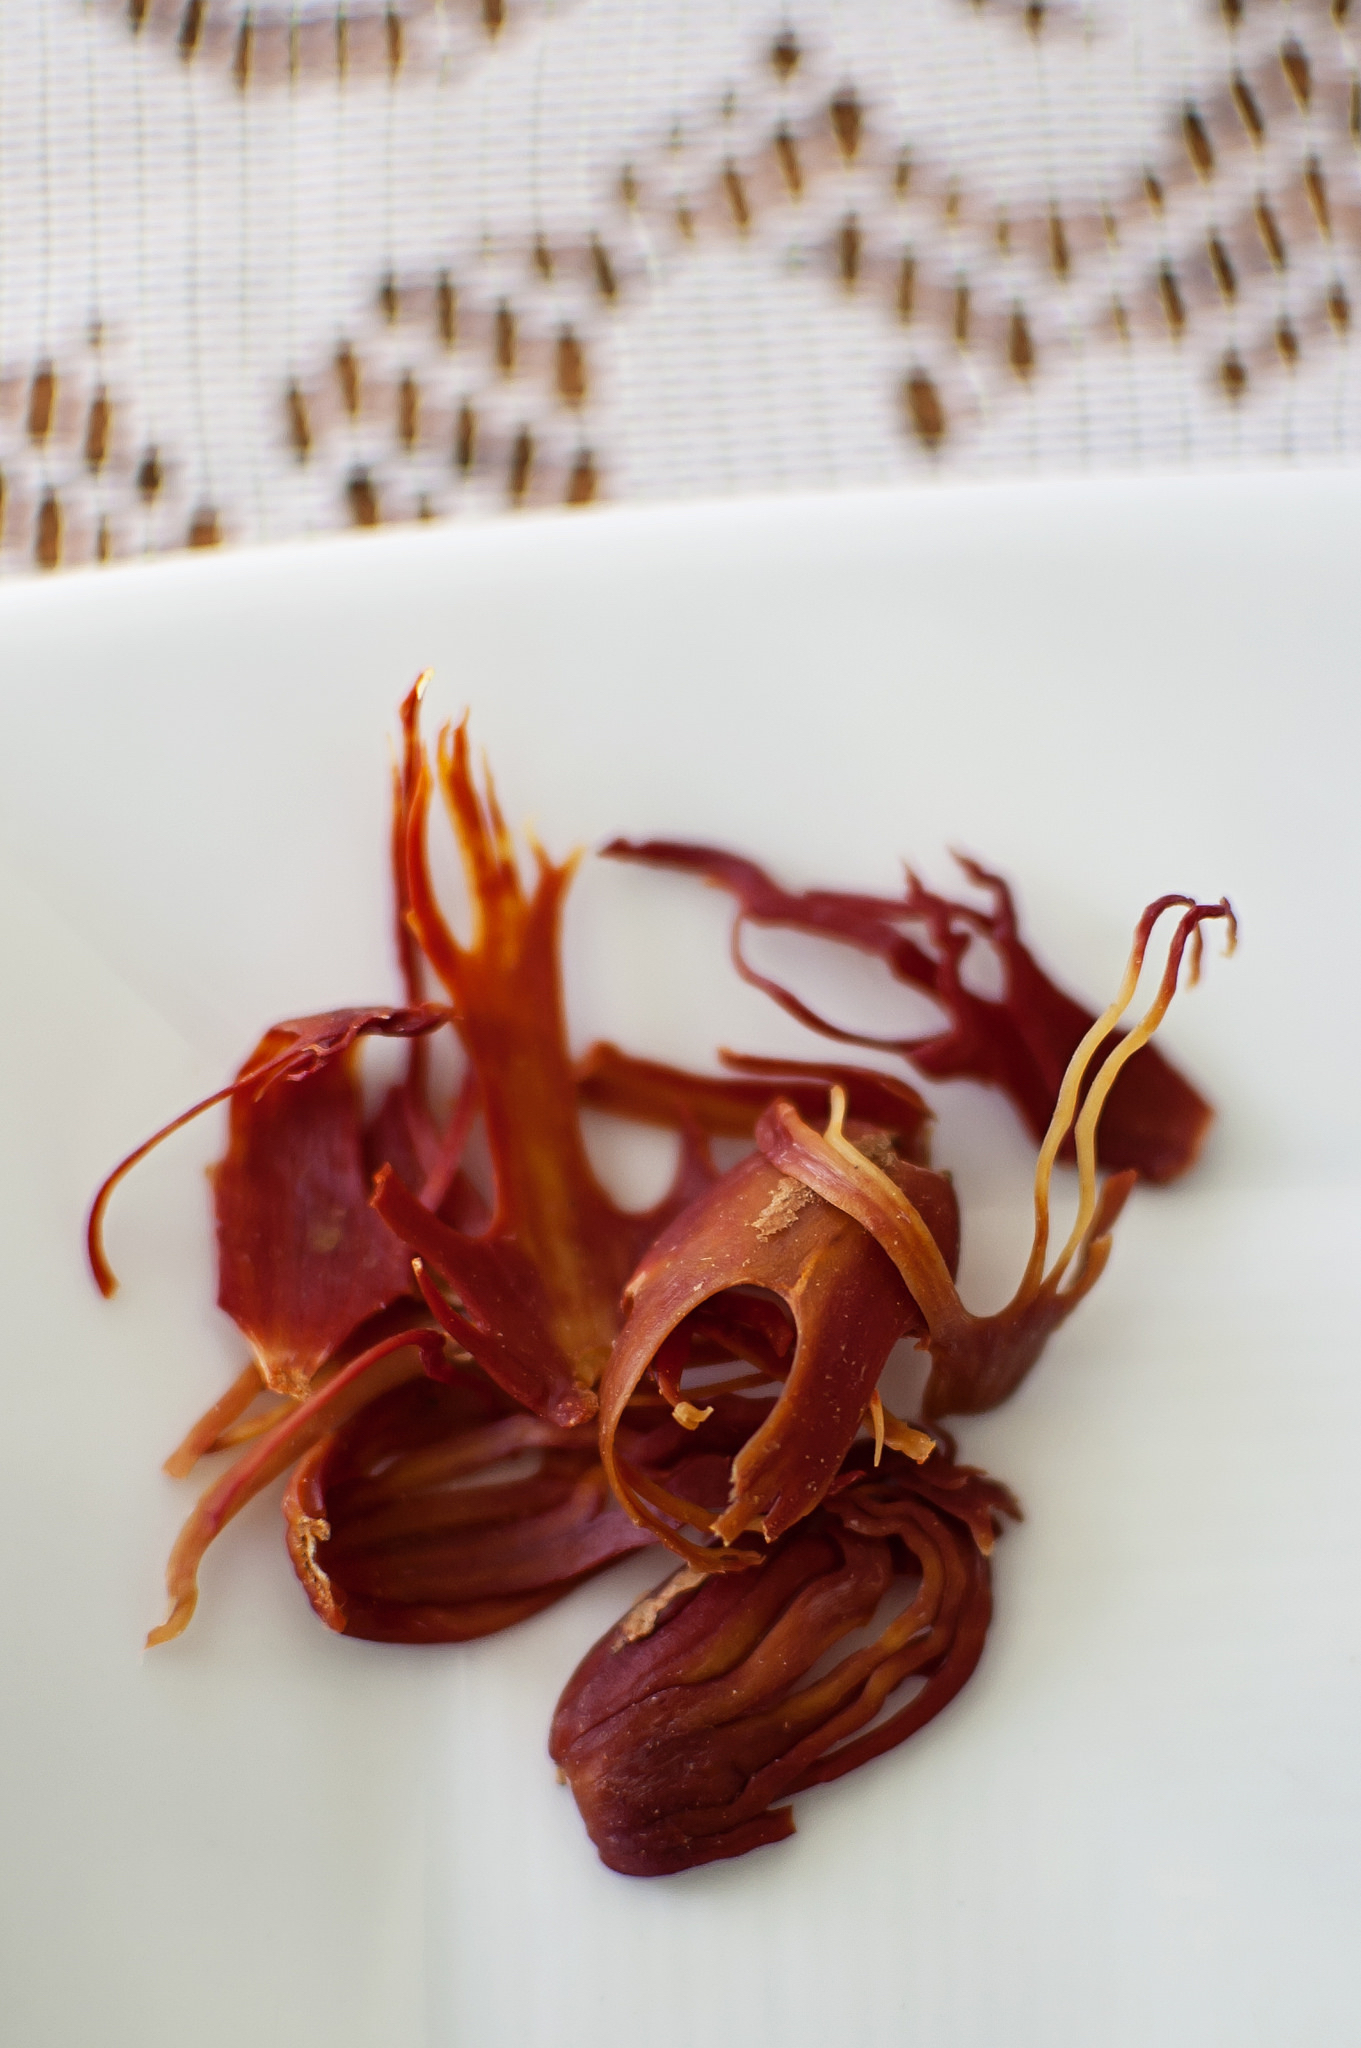 Mace or Nutmeg